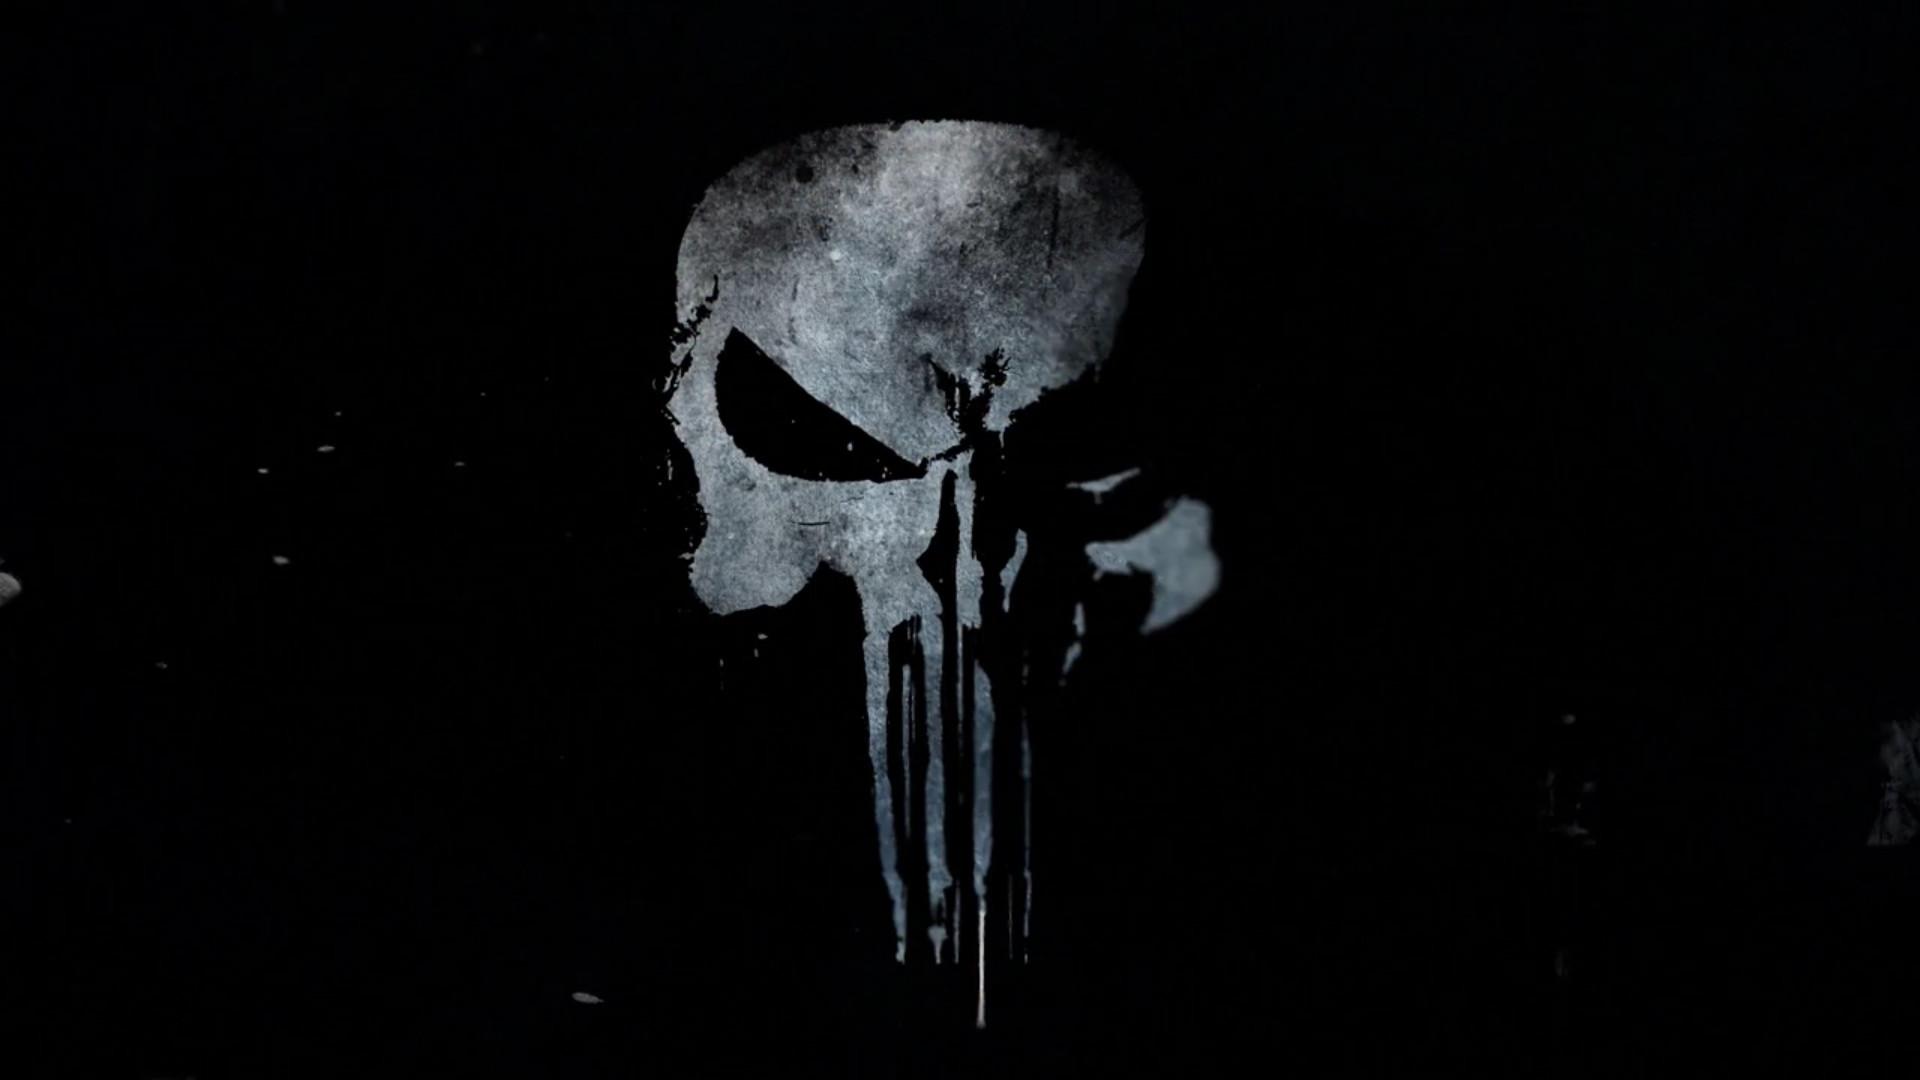 The Punisher Netflix Original Series Finishes Production (PHOTO GALLERY)